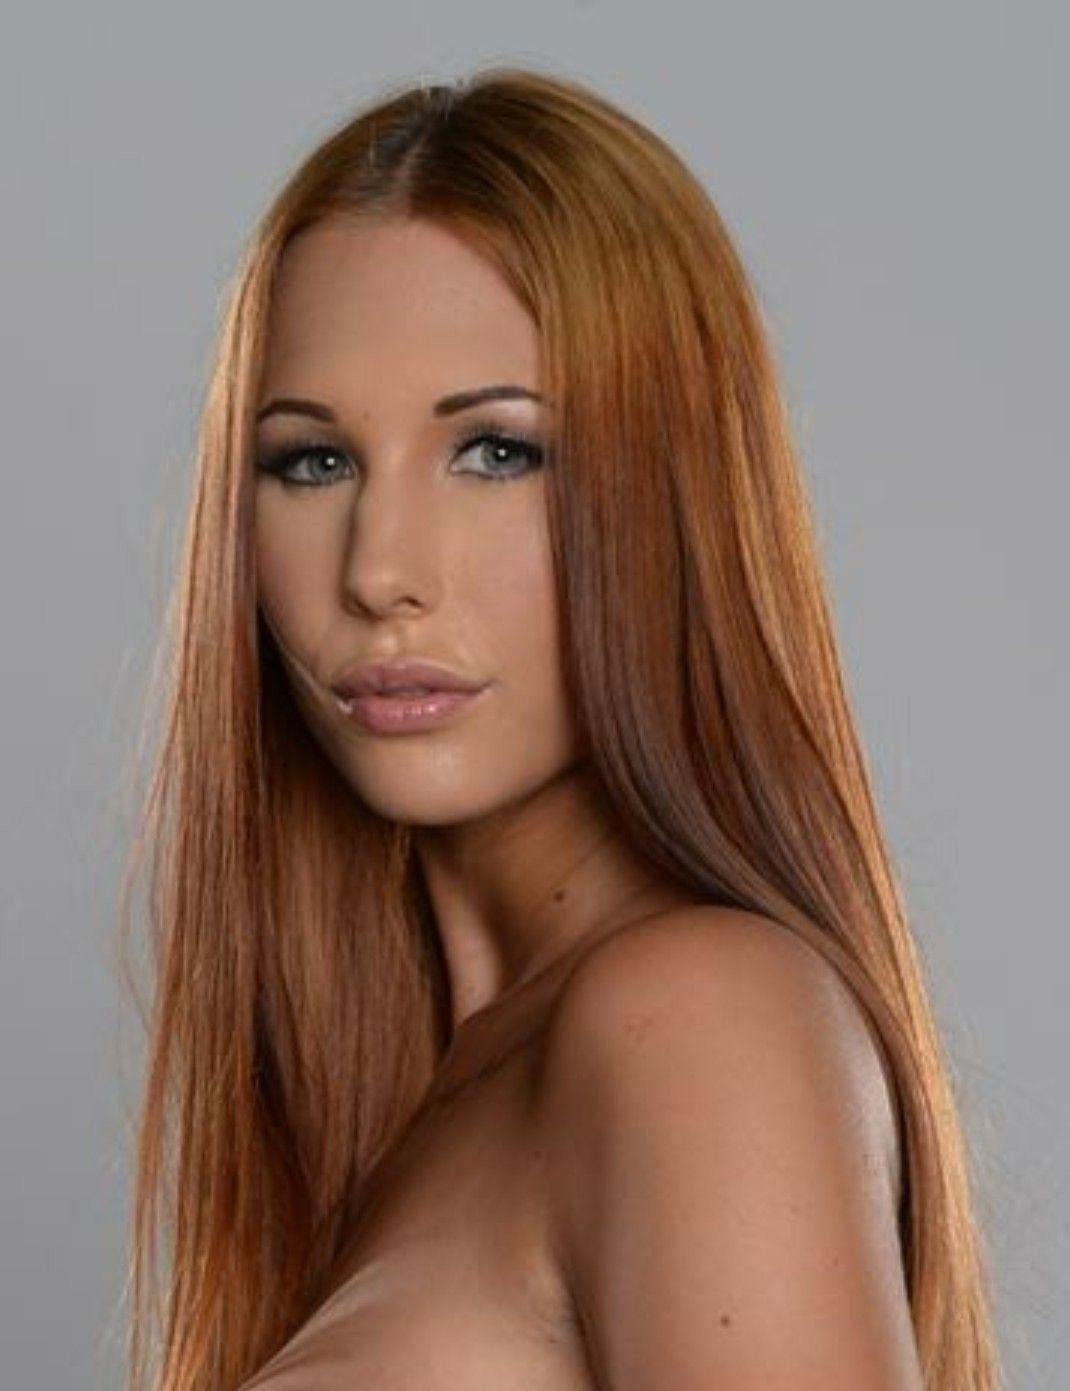 Kyra Hot Nude Photos 8